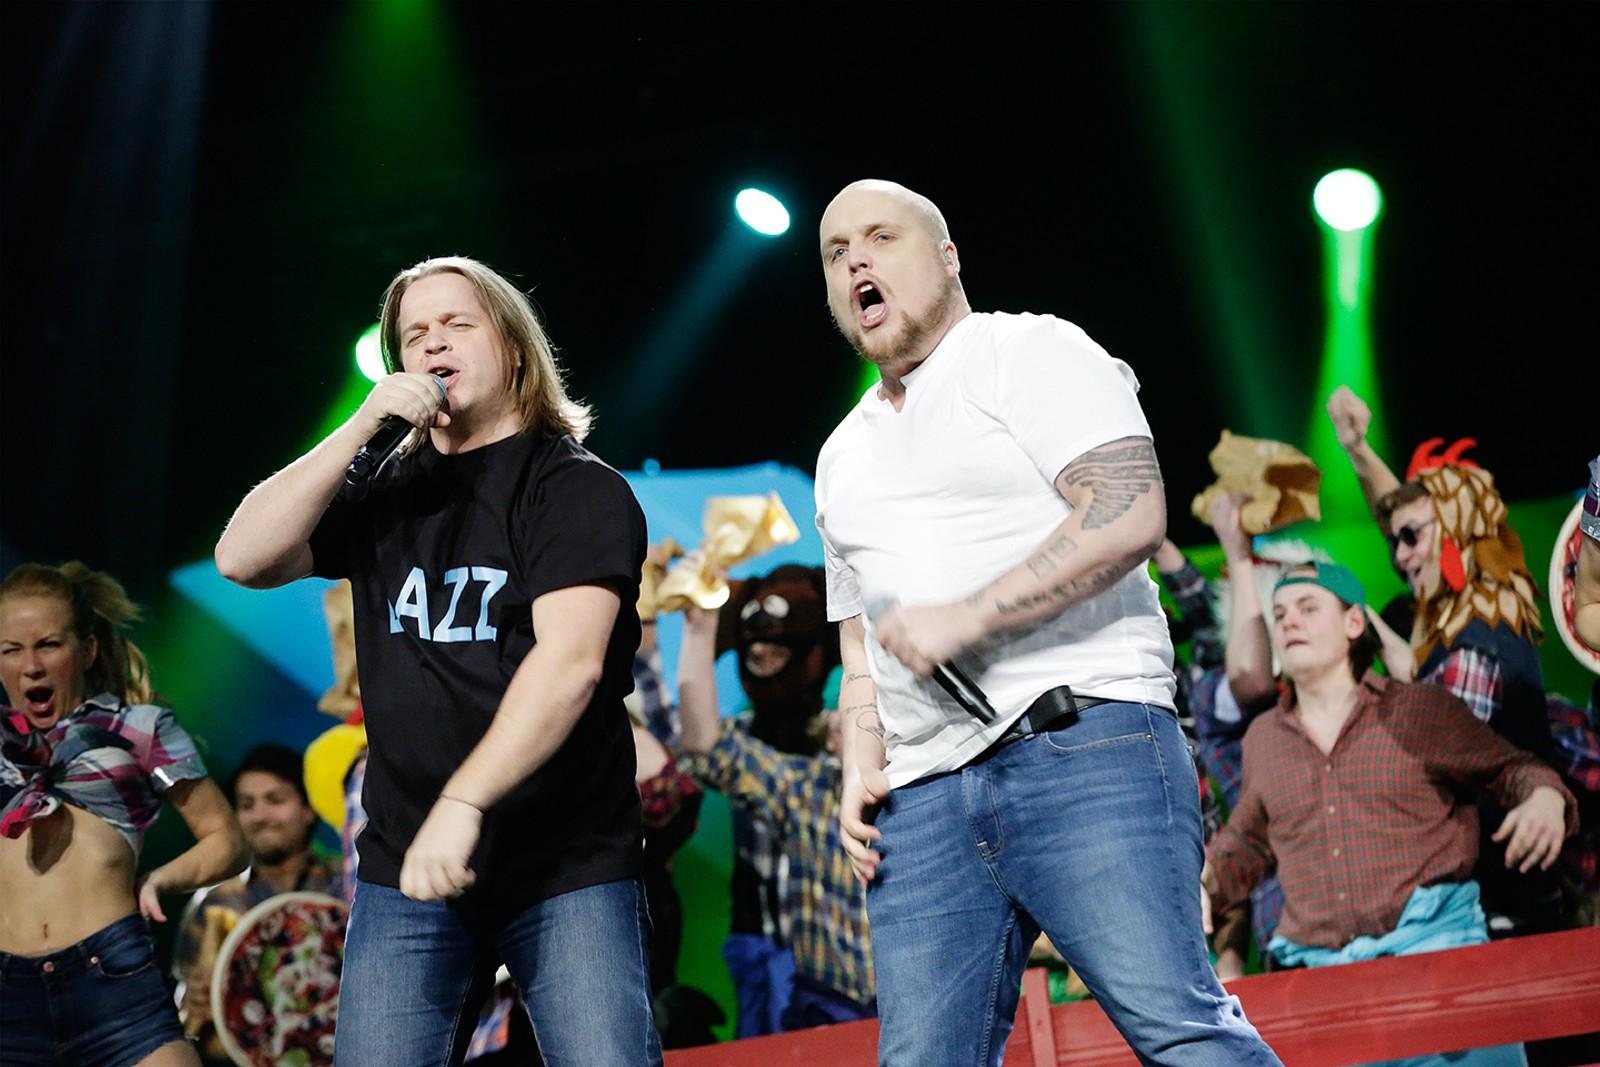 Partyduoen Staysman og Lazz fra Fredrikstad var blant 2014s mest strømmede artister. De inntar Spektrum med låta «En Godt Stekt Pizza».